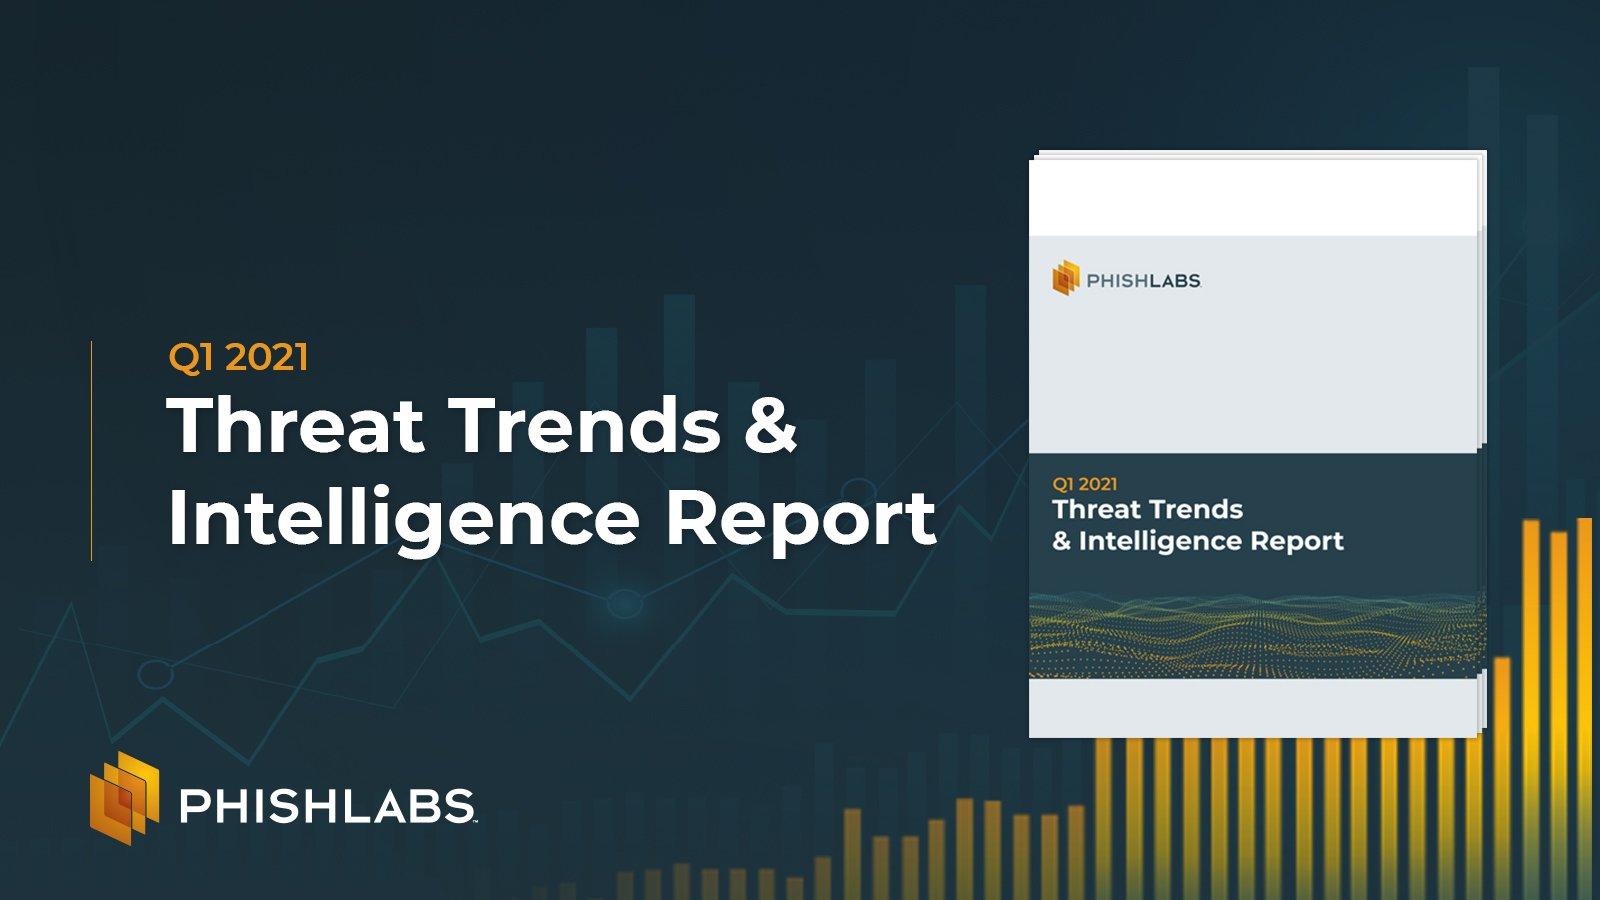 Q1 2021 Threat Trends & Intelligence Report